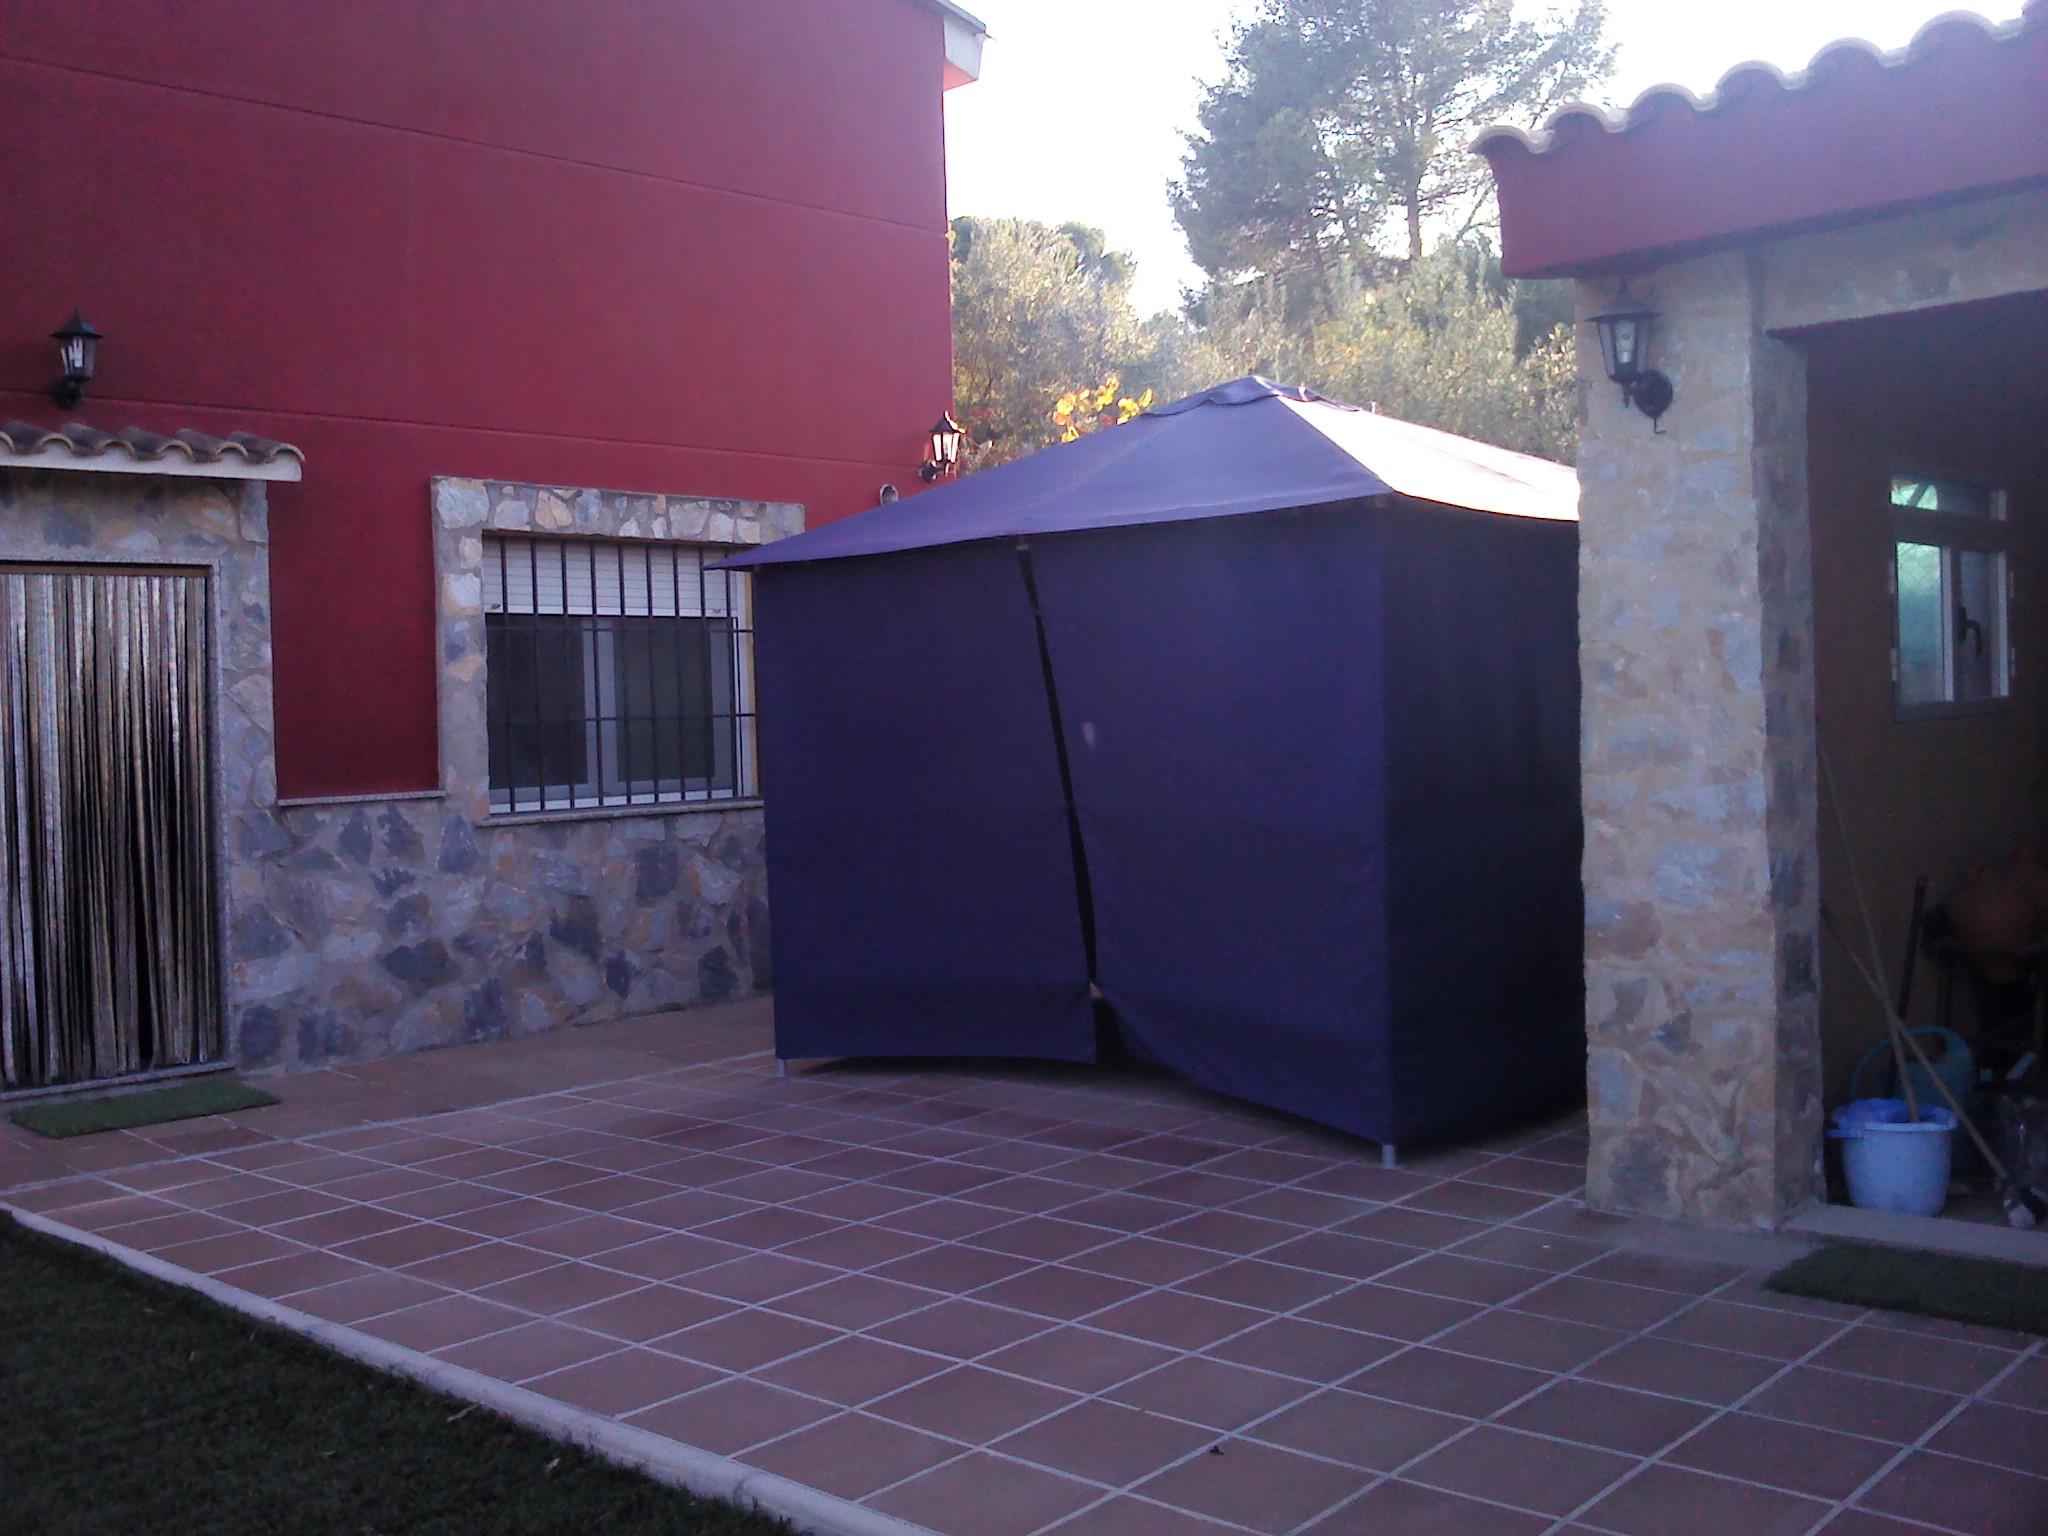 Venta chal cocentaina alicante espana cami alcudia 74 - Cocentaina espana ...